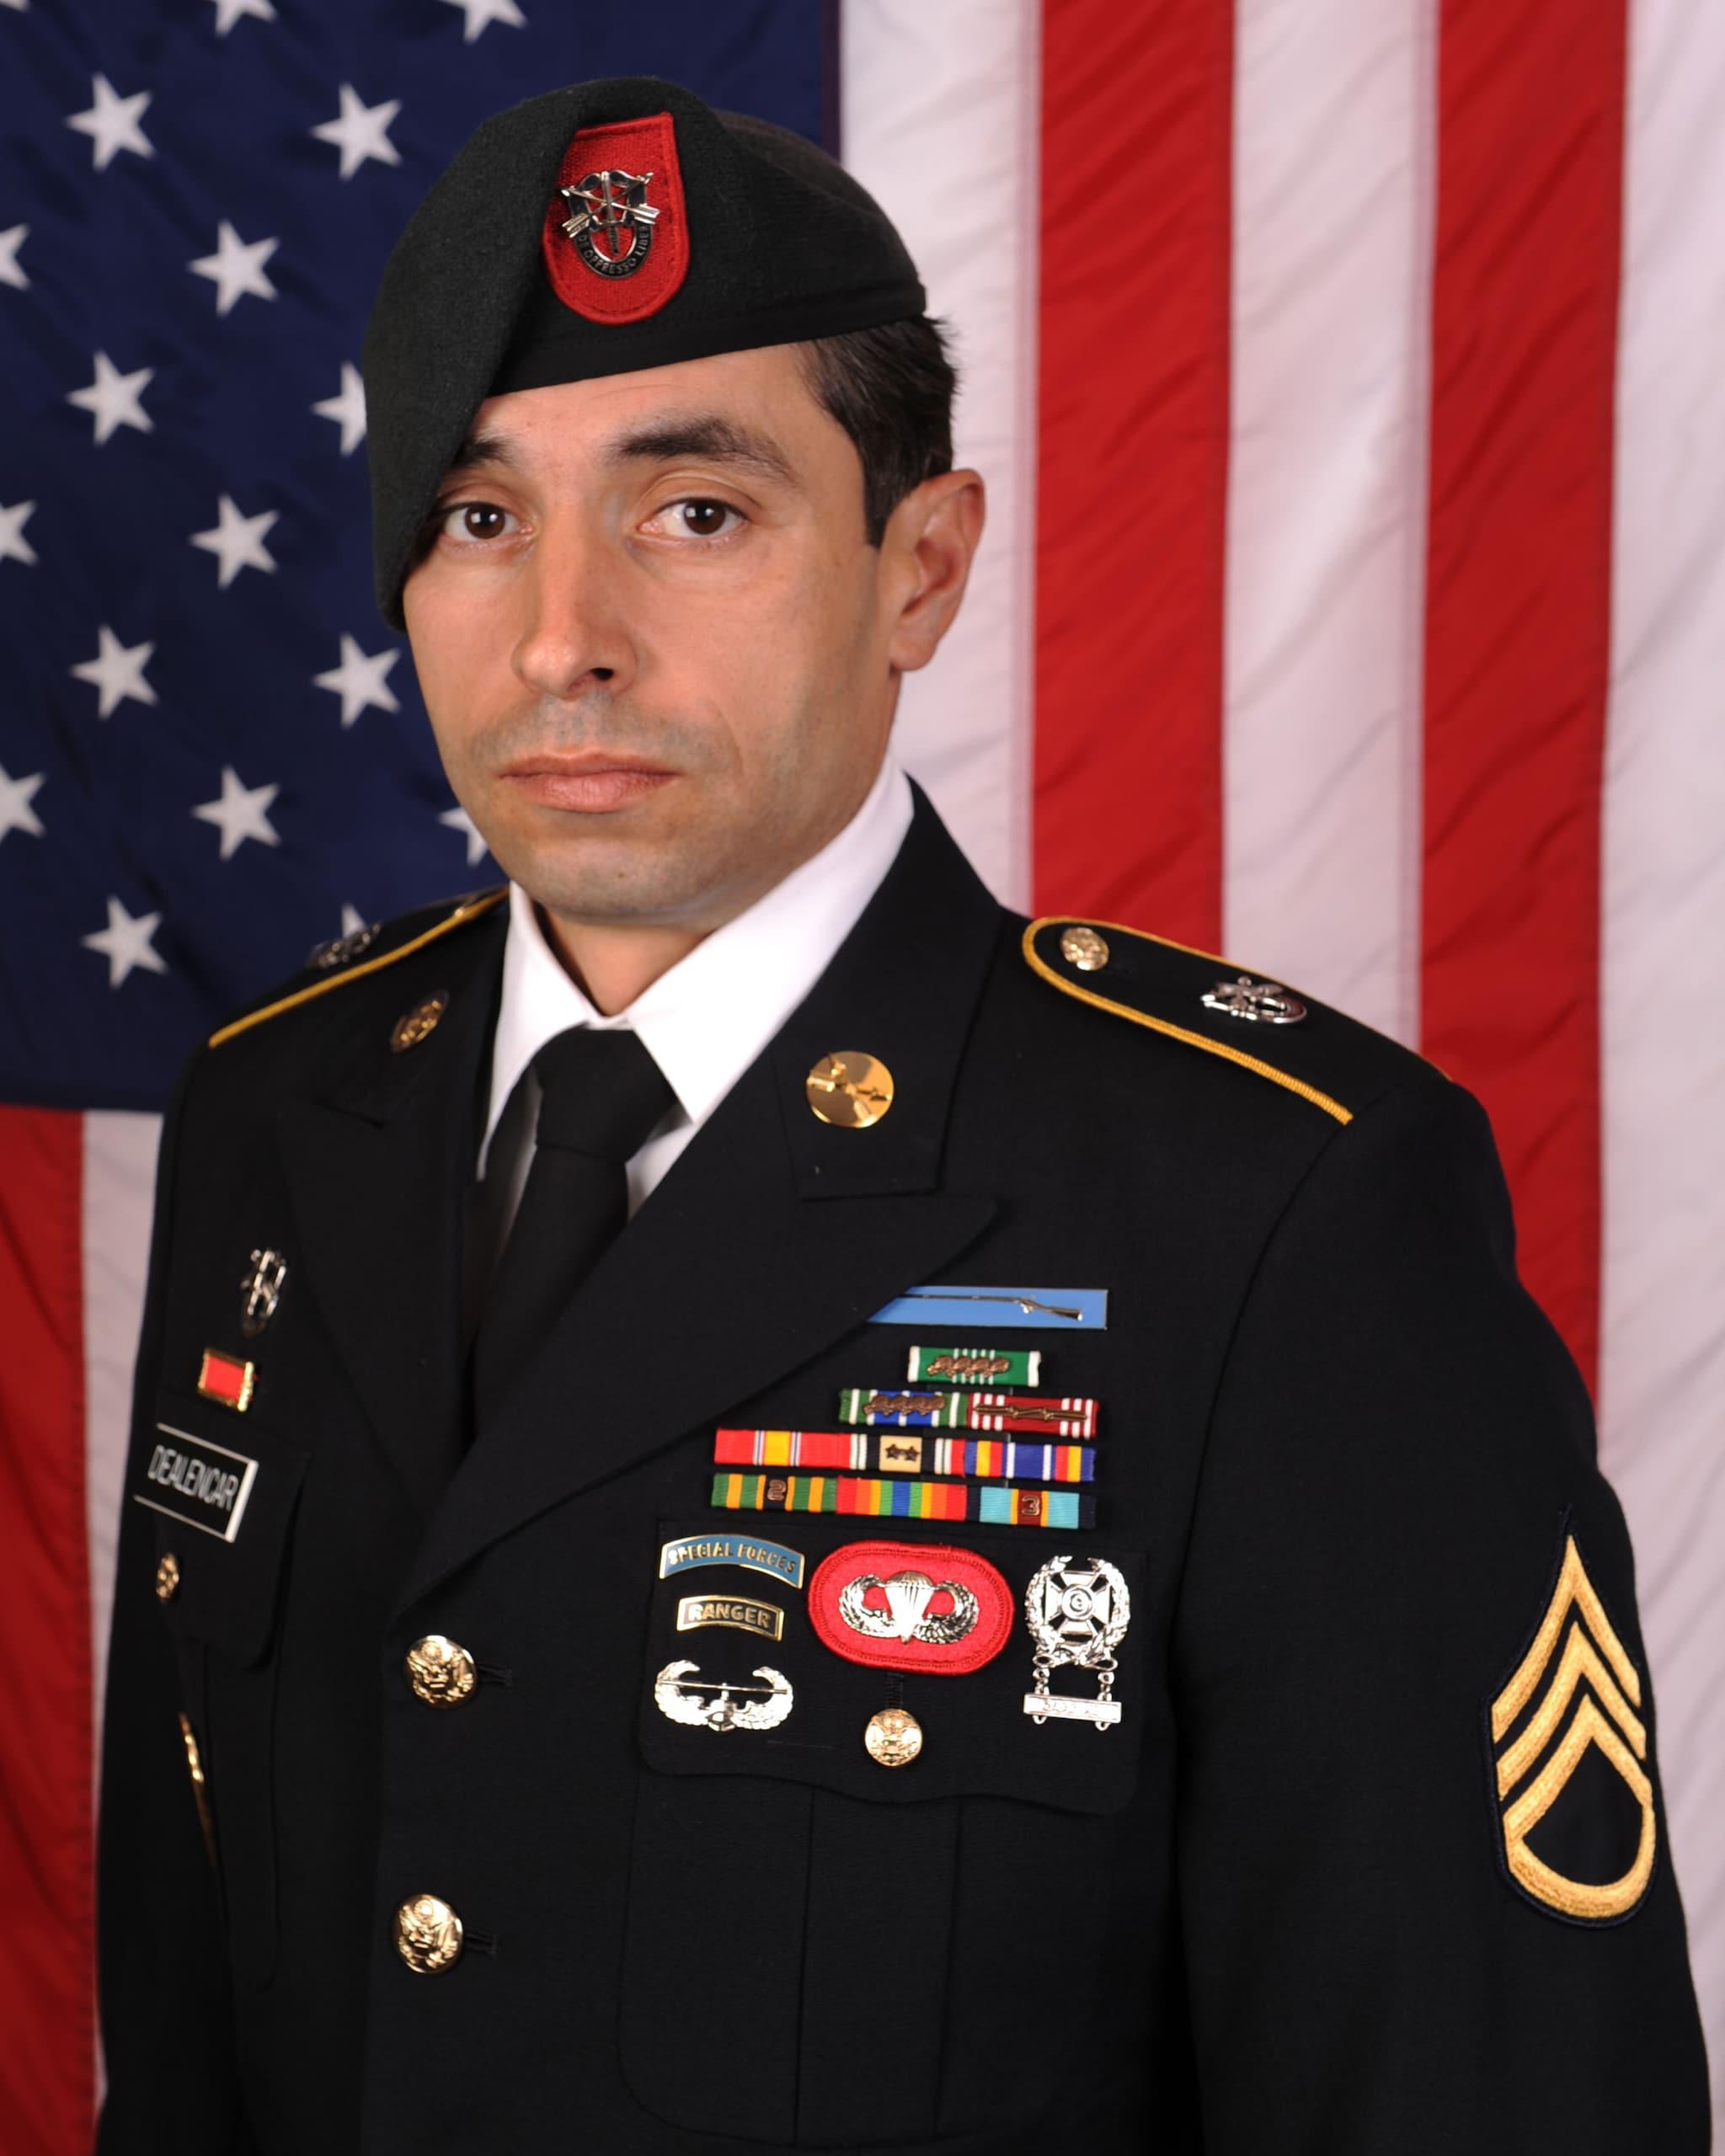 Staff Sgt. Mark R. De Alencar